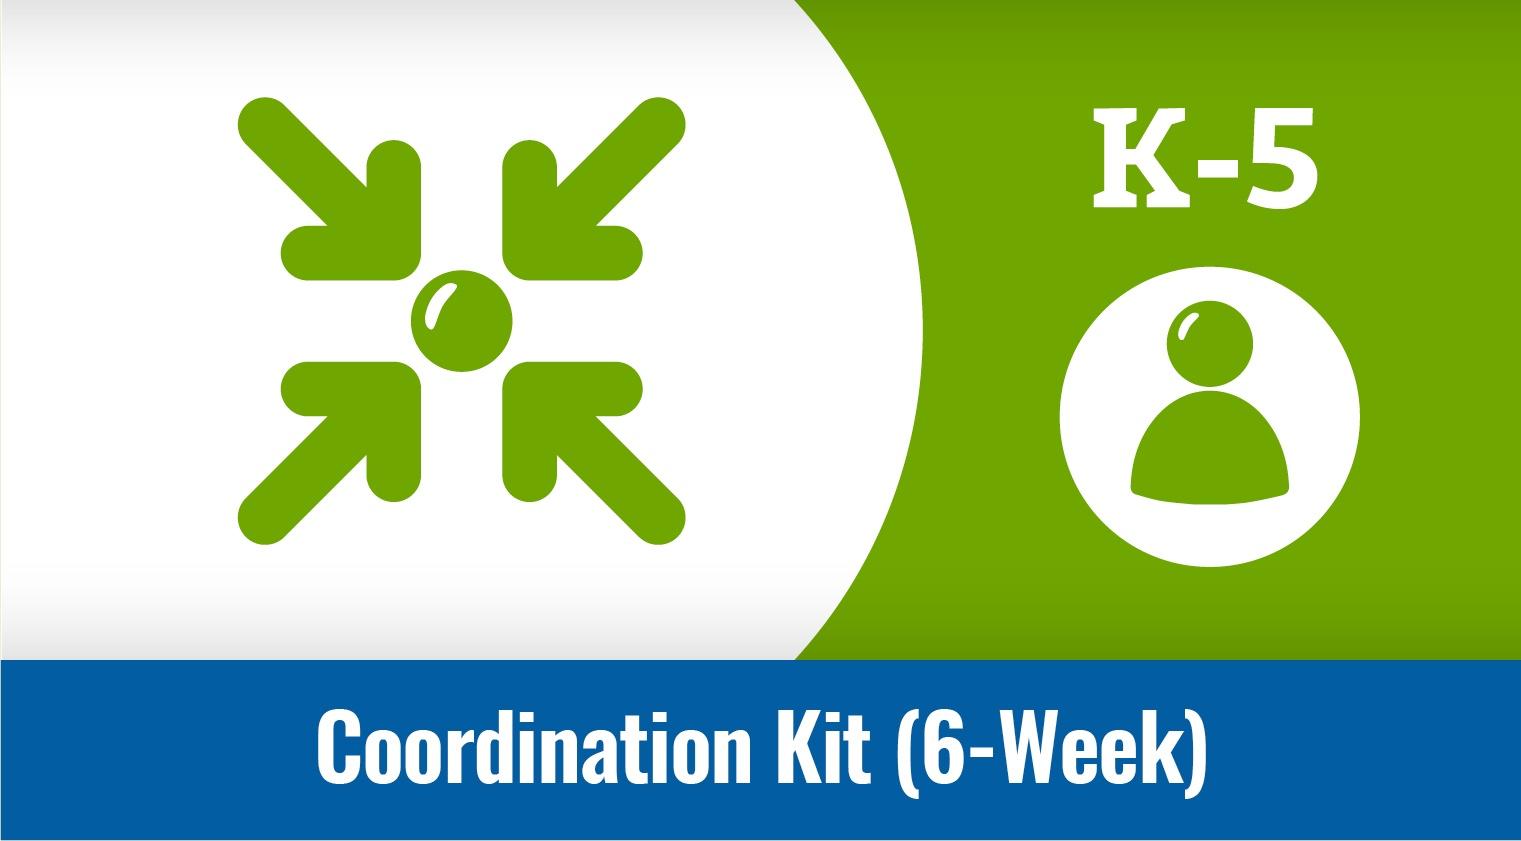 Coordination Kit: 6-Week